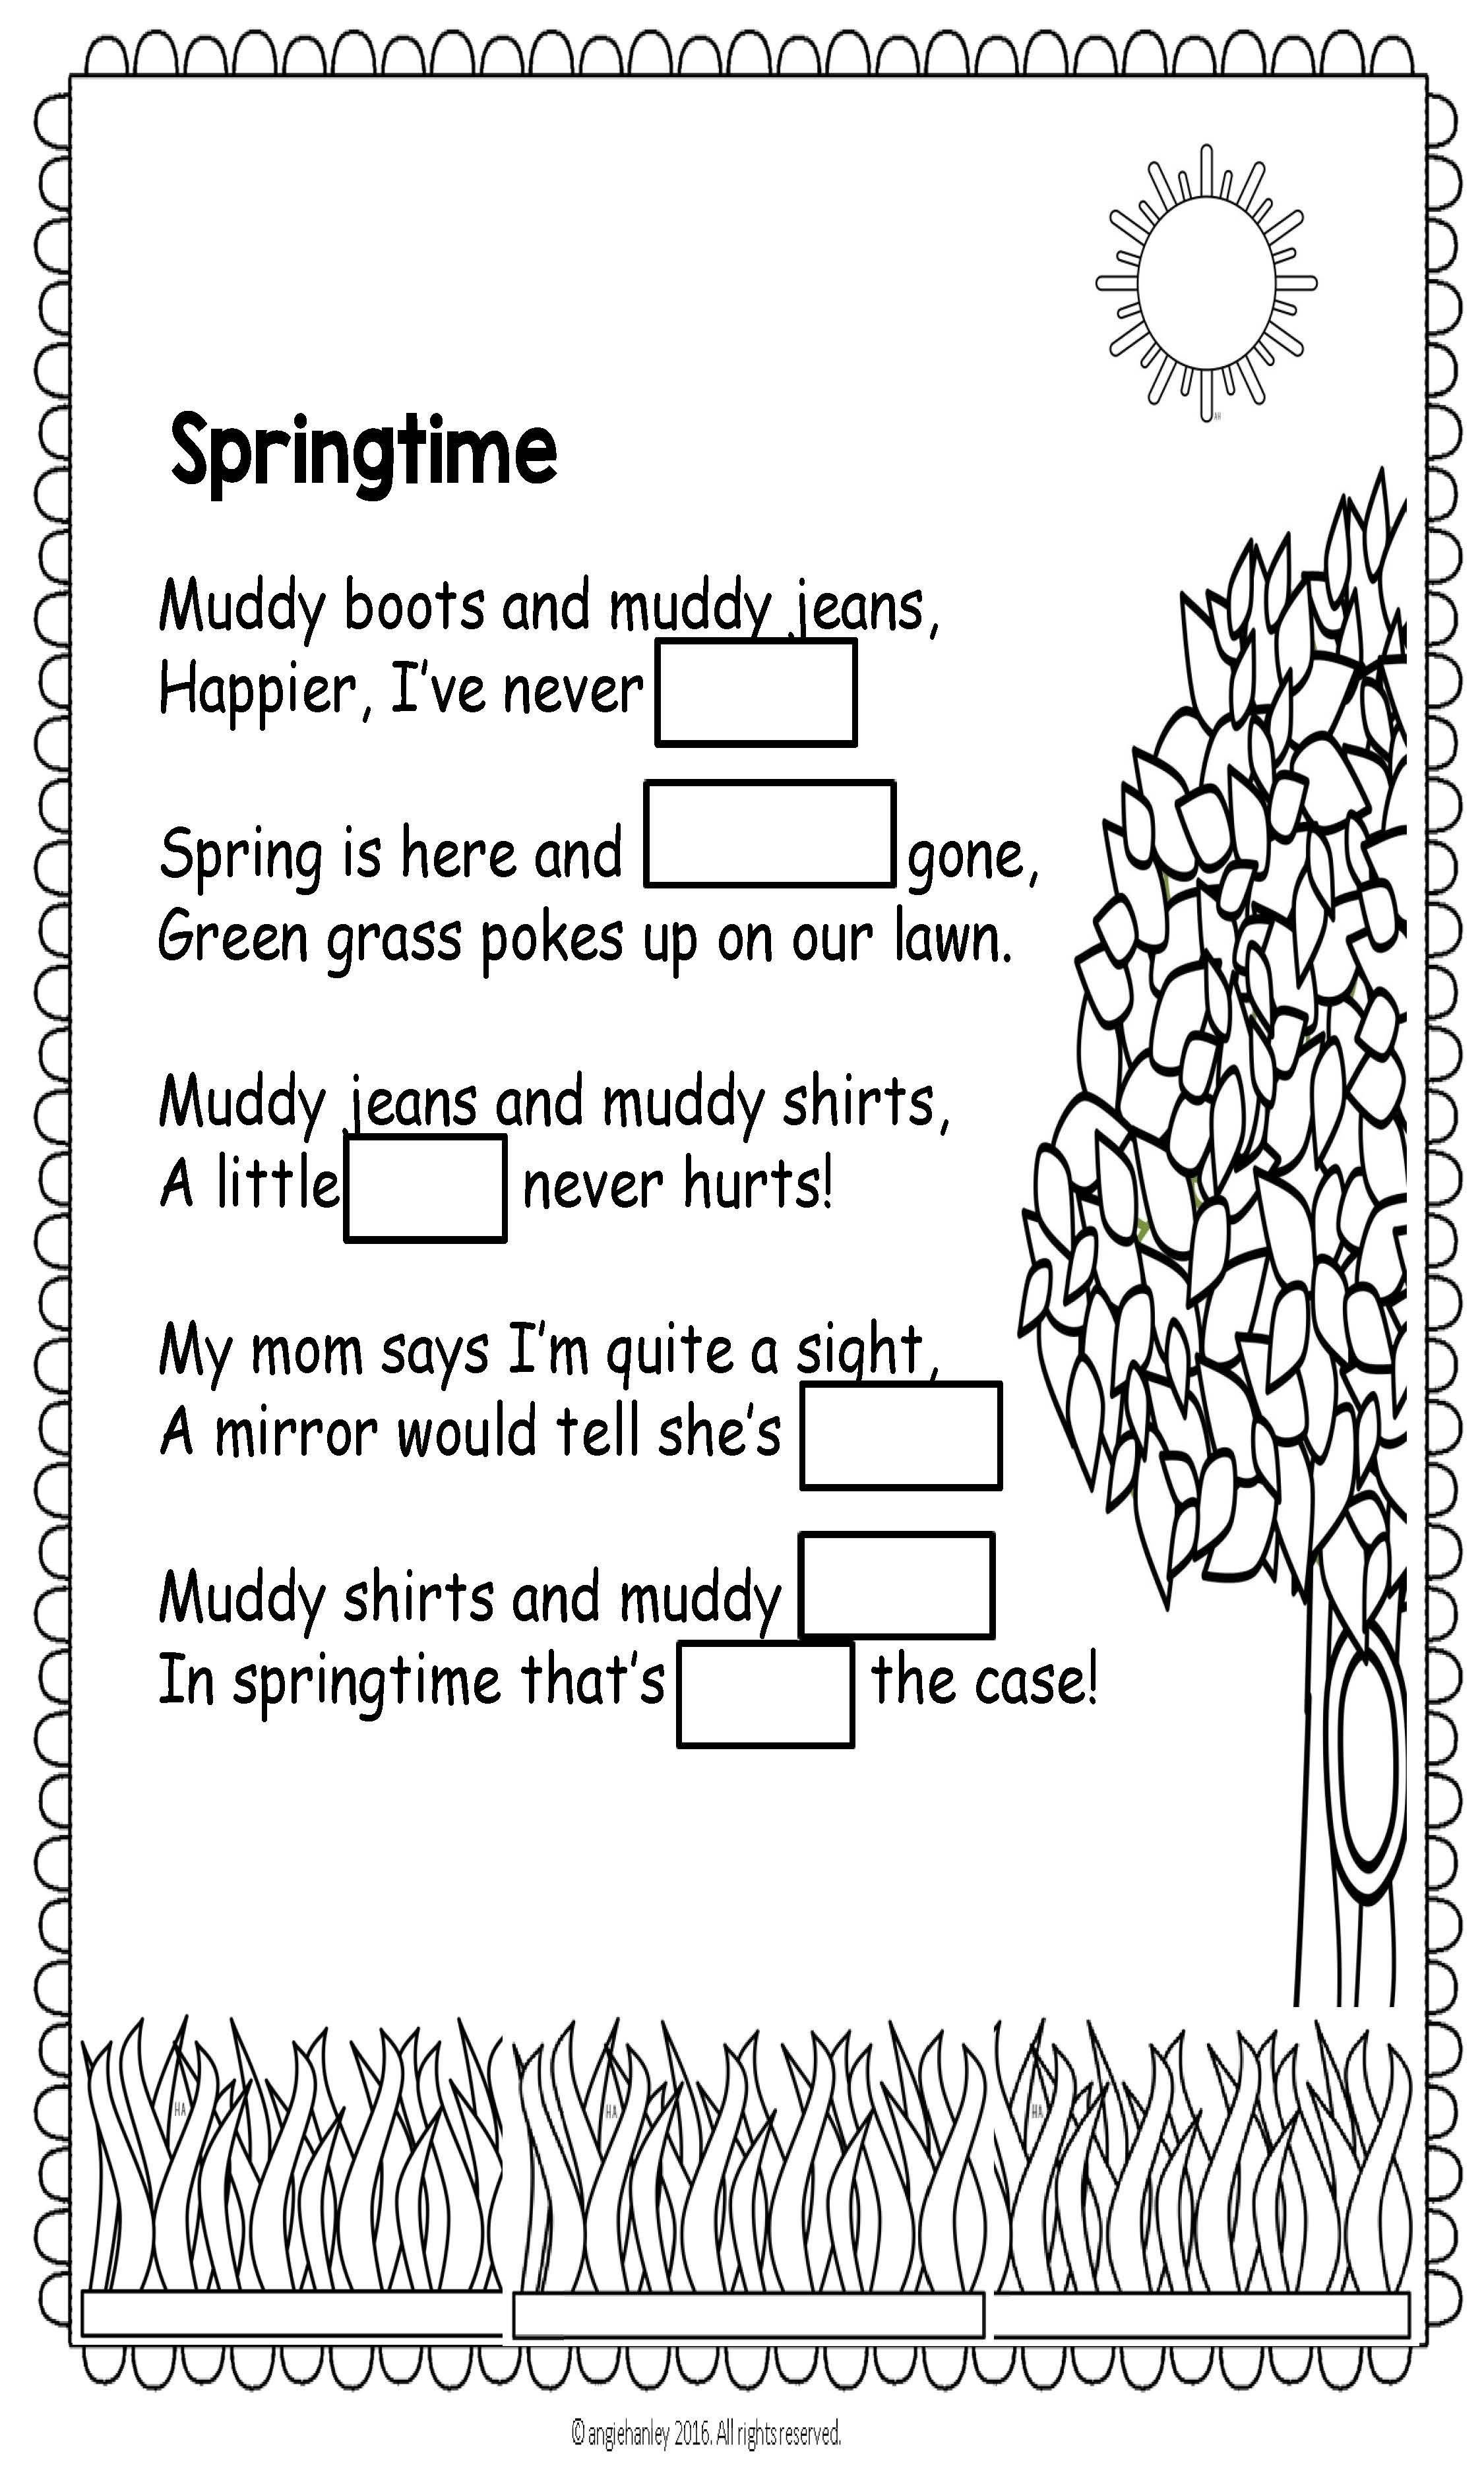 Spring Poem For Shared Reading